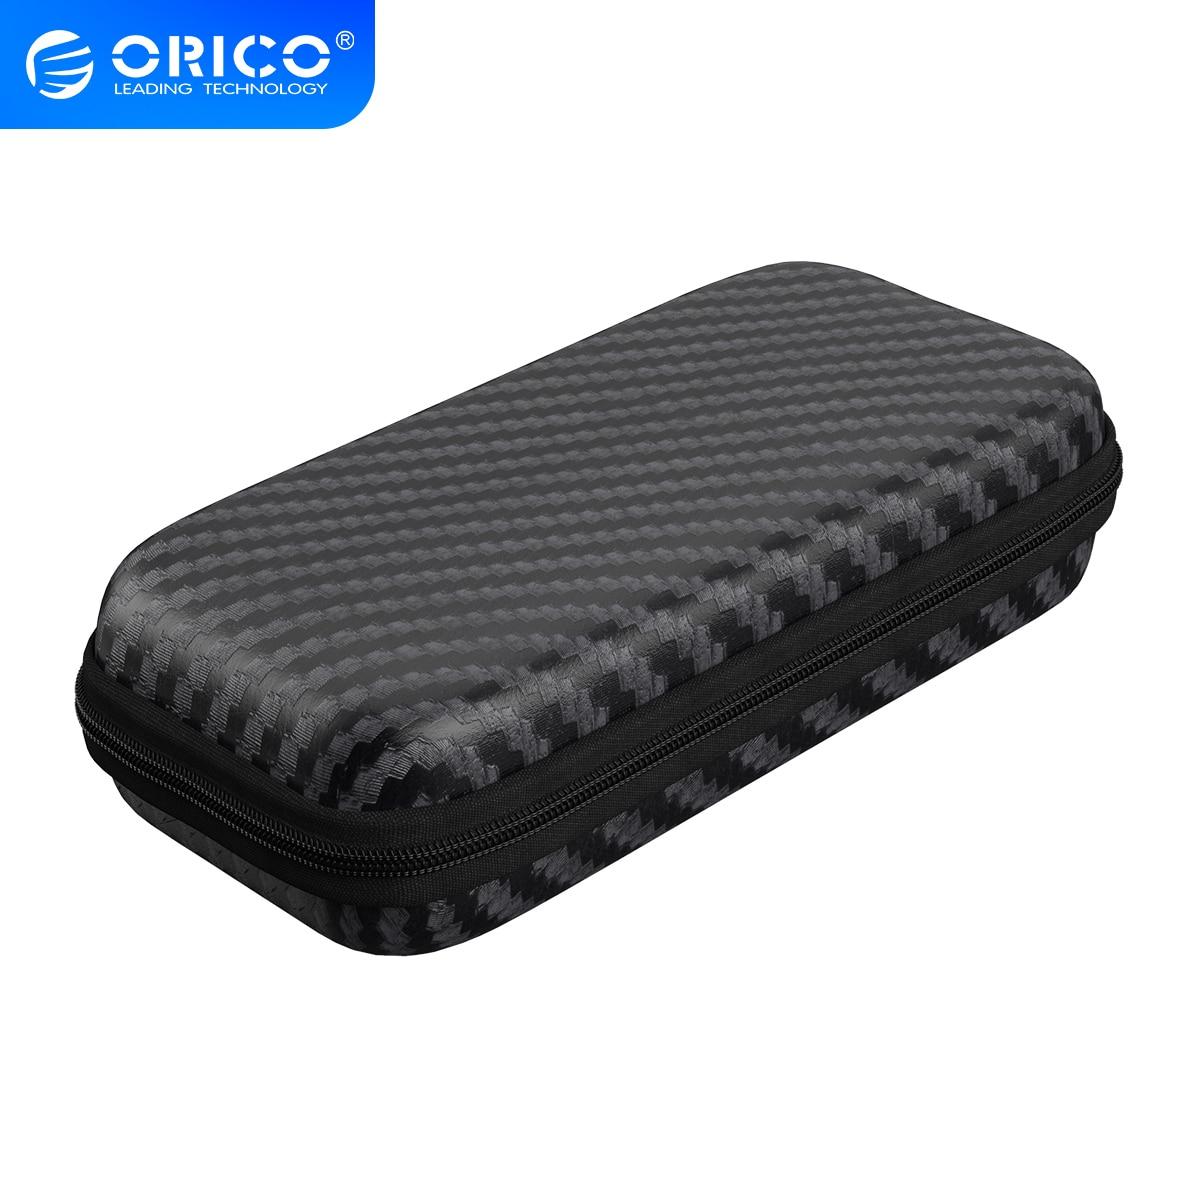 ORICO M.2 сумка для хранения жесткого диска EVA портативный HDD Чехол Коробка для жесткого диска Ударопрочный Футляр для внешнего жесткого диска Ч...